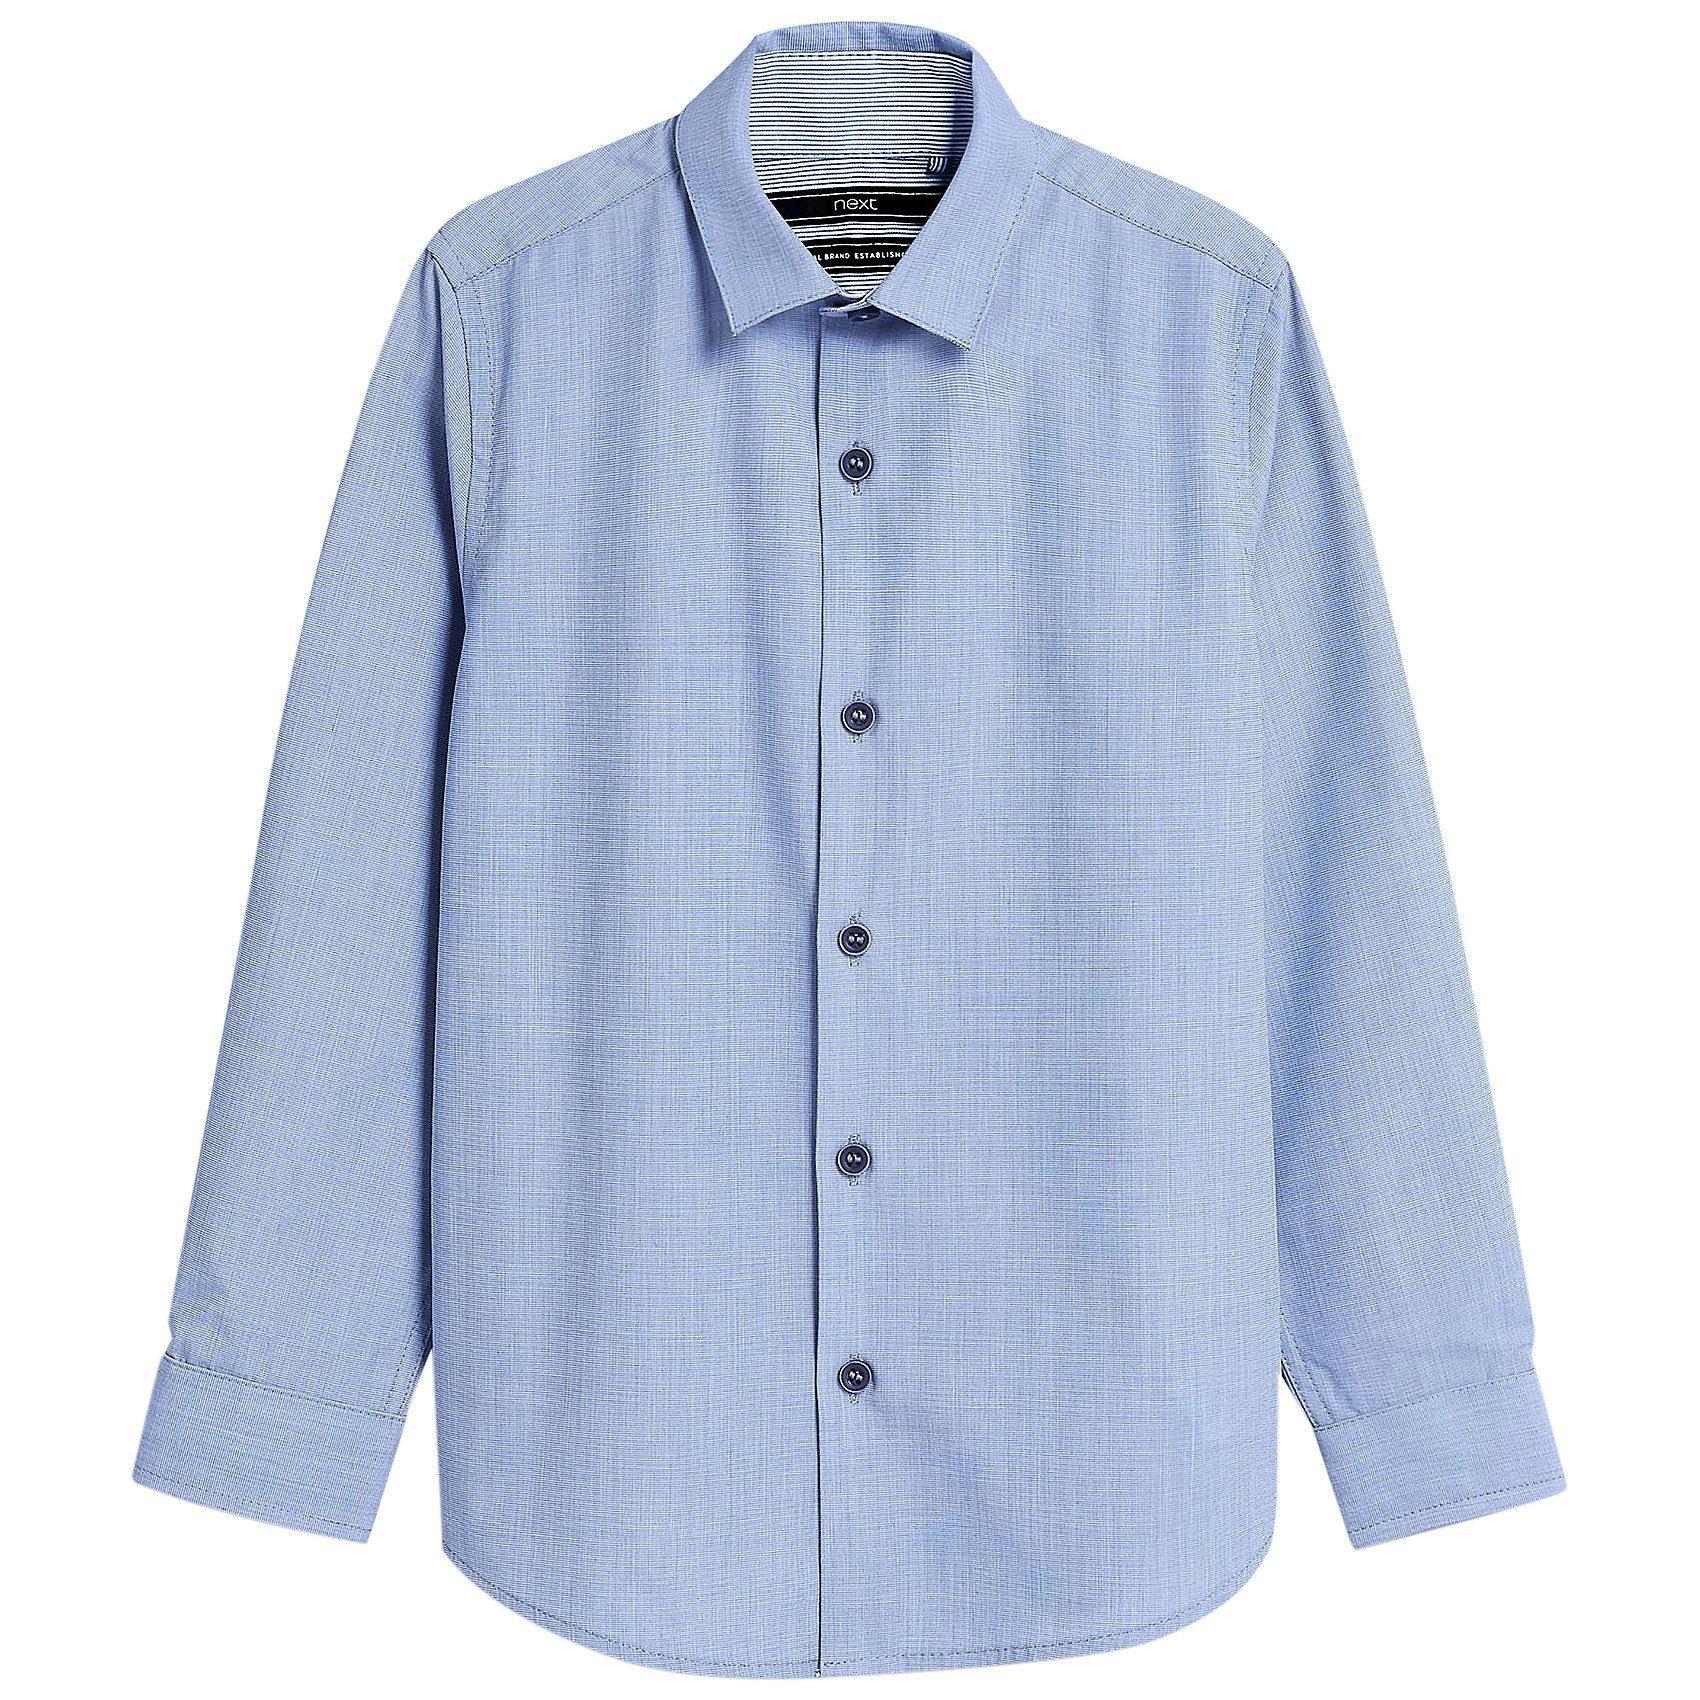 Herren,  Kinder Next Kinder Langarmhemd blau   05057979833806, 05059109011832